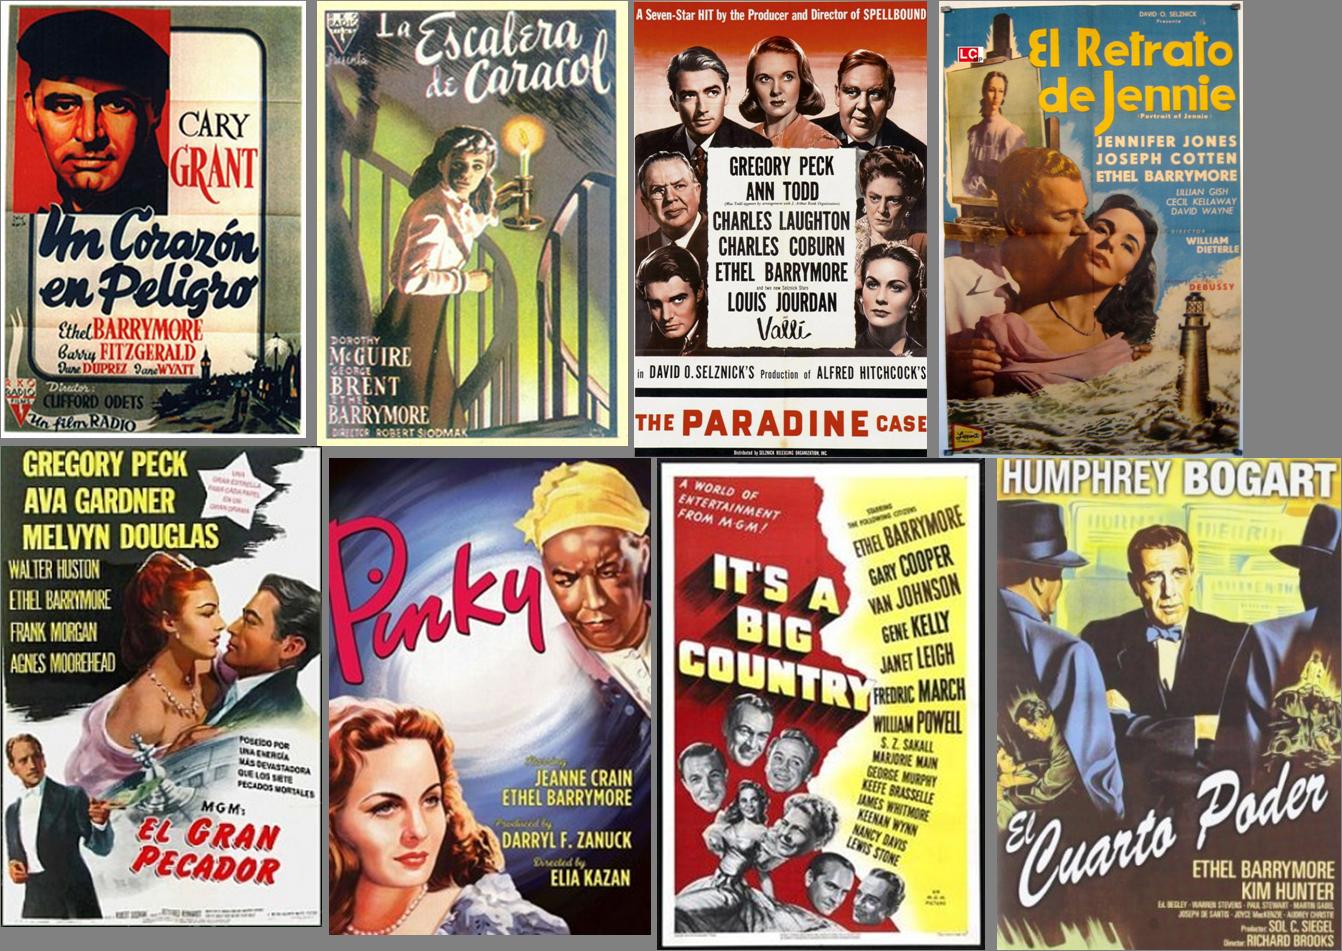 Ethel Barrymore afiches